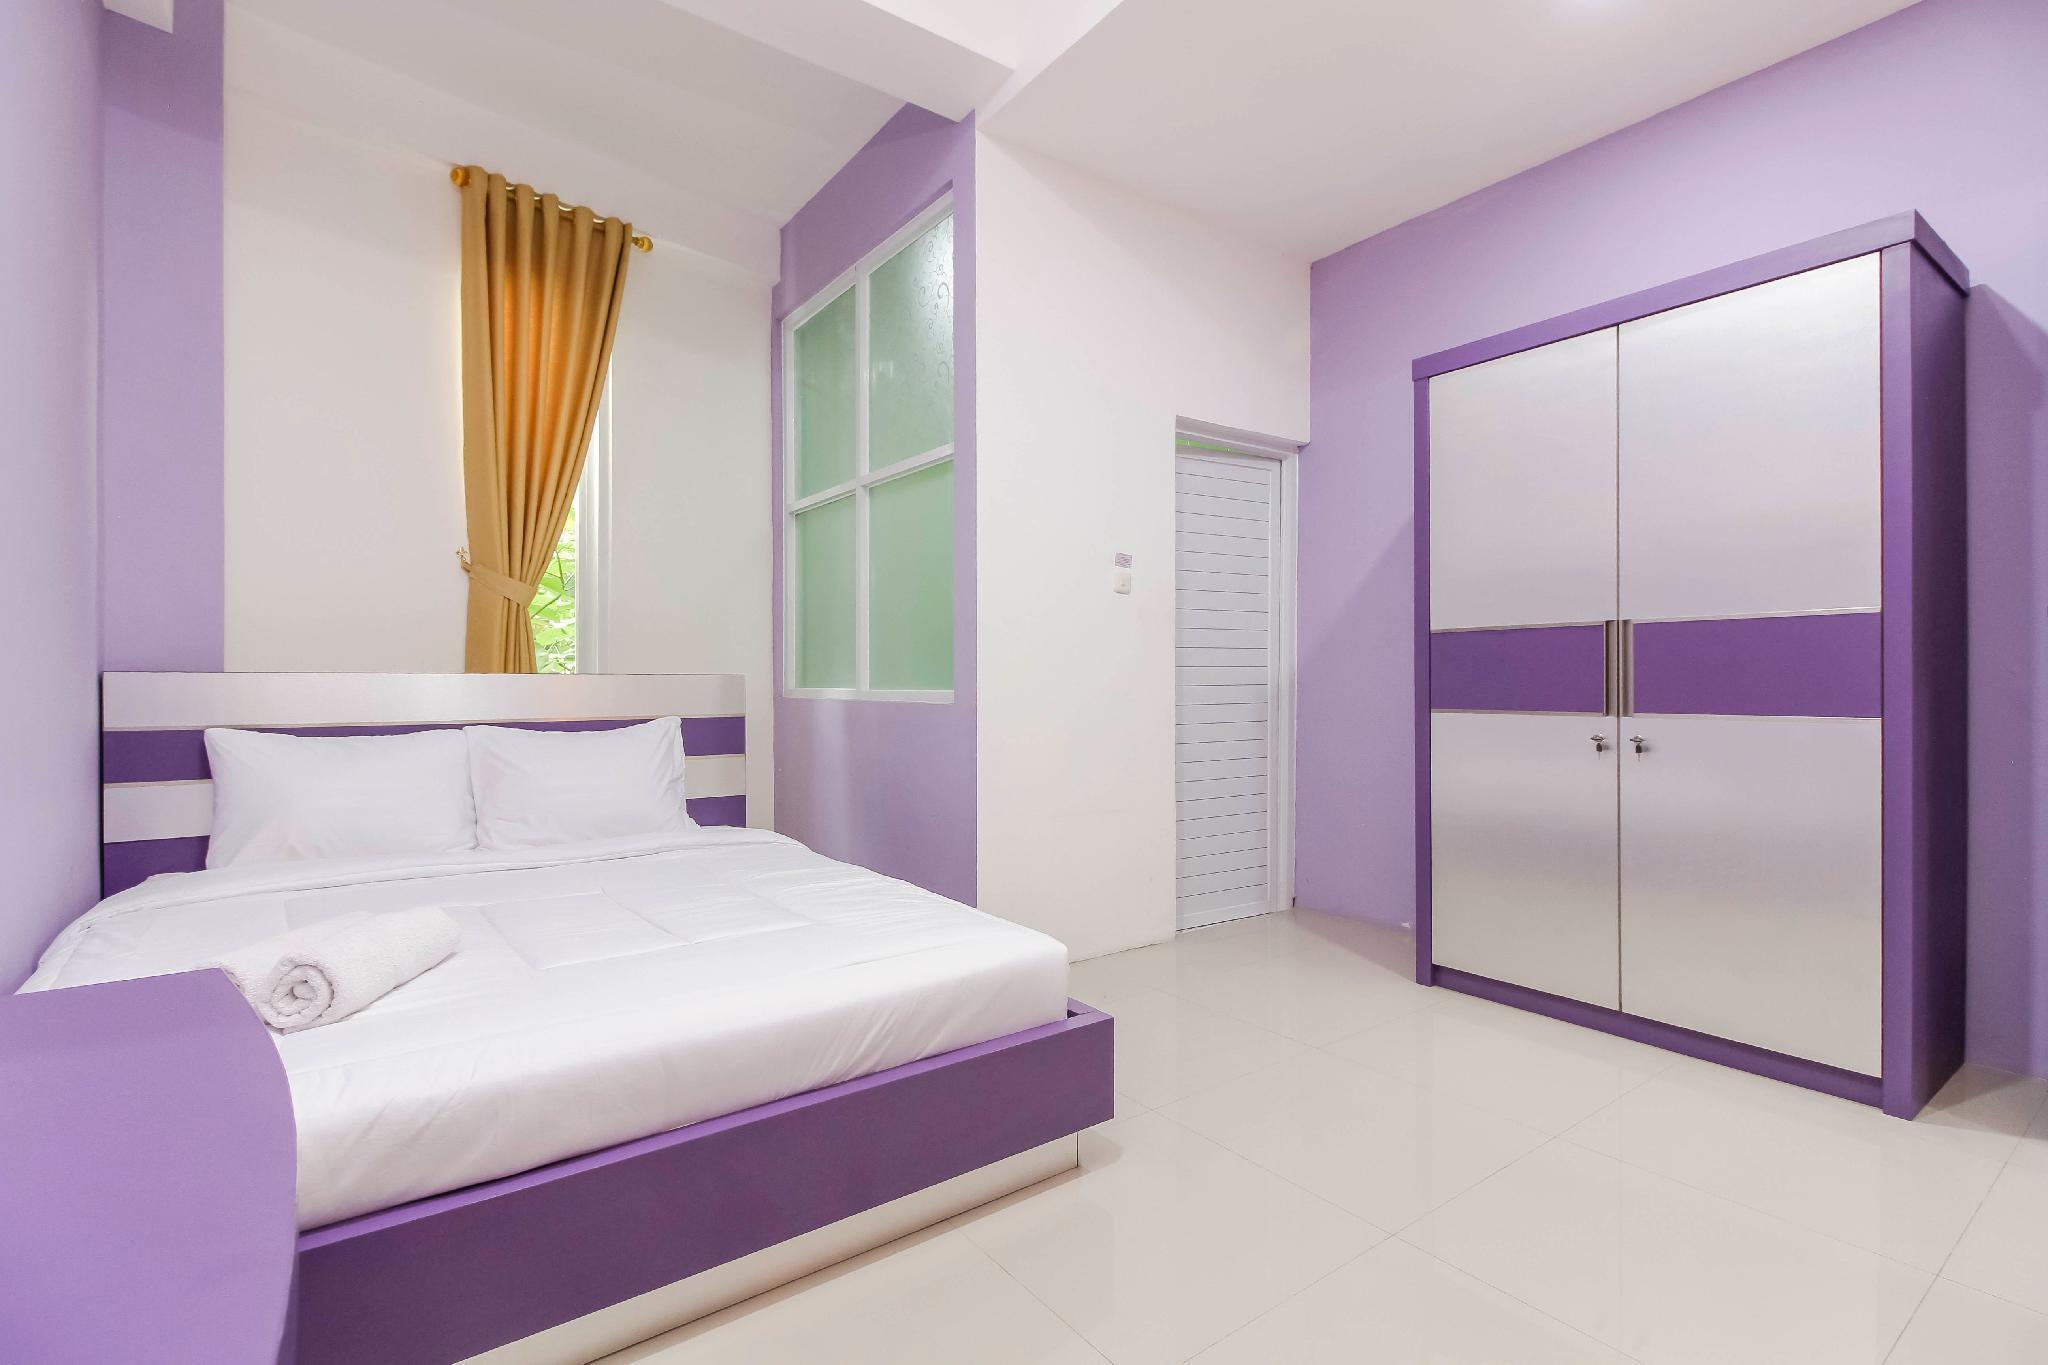 Ungu Vivo Hotel Bekasi, Bekasi